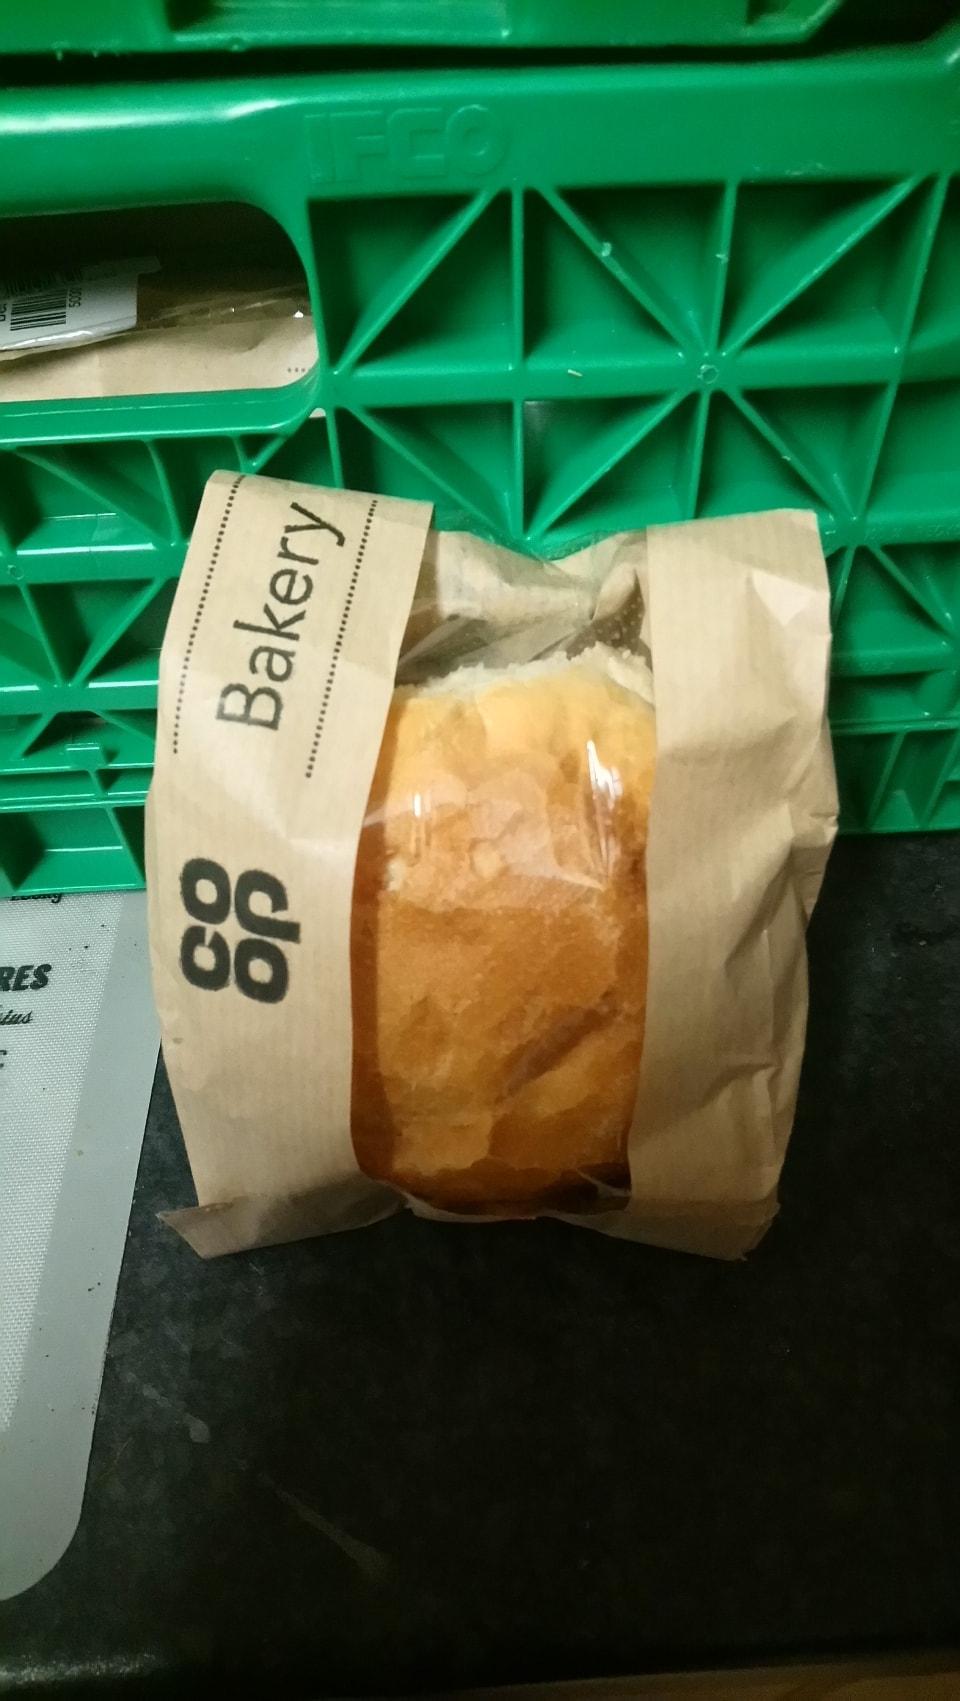 Crusty white roll